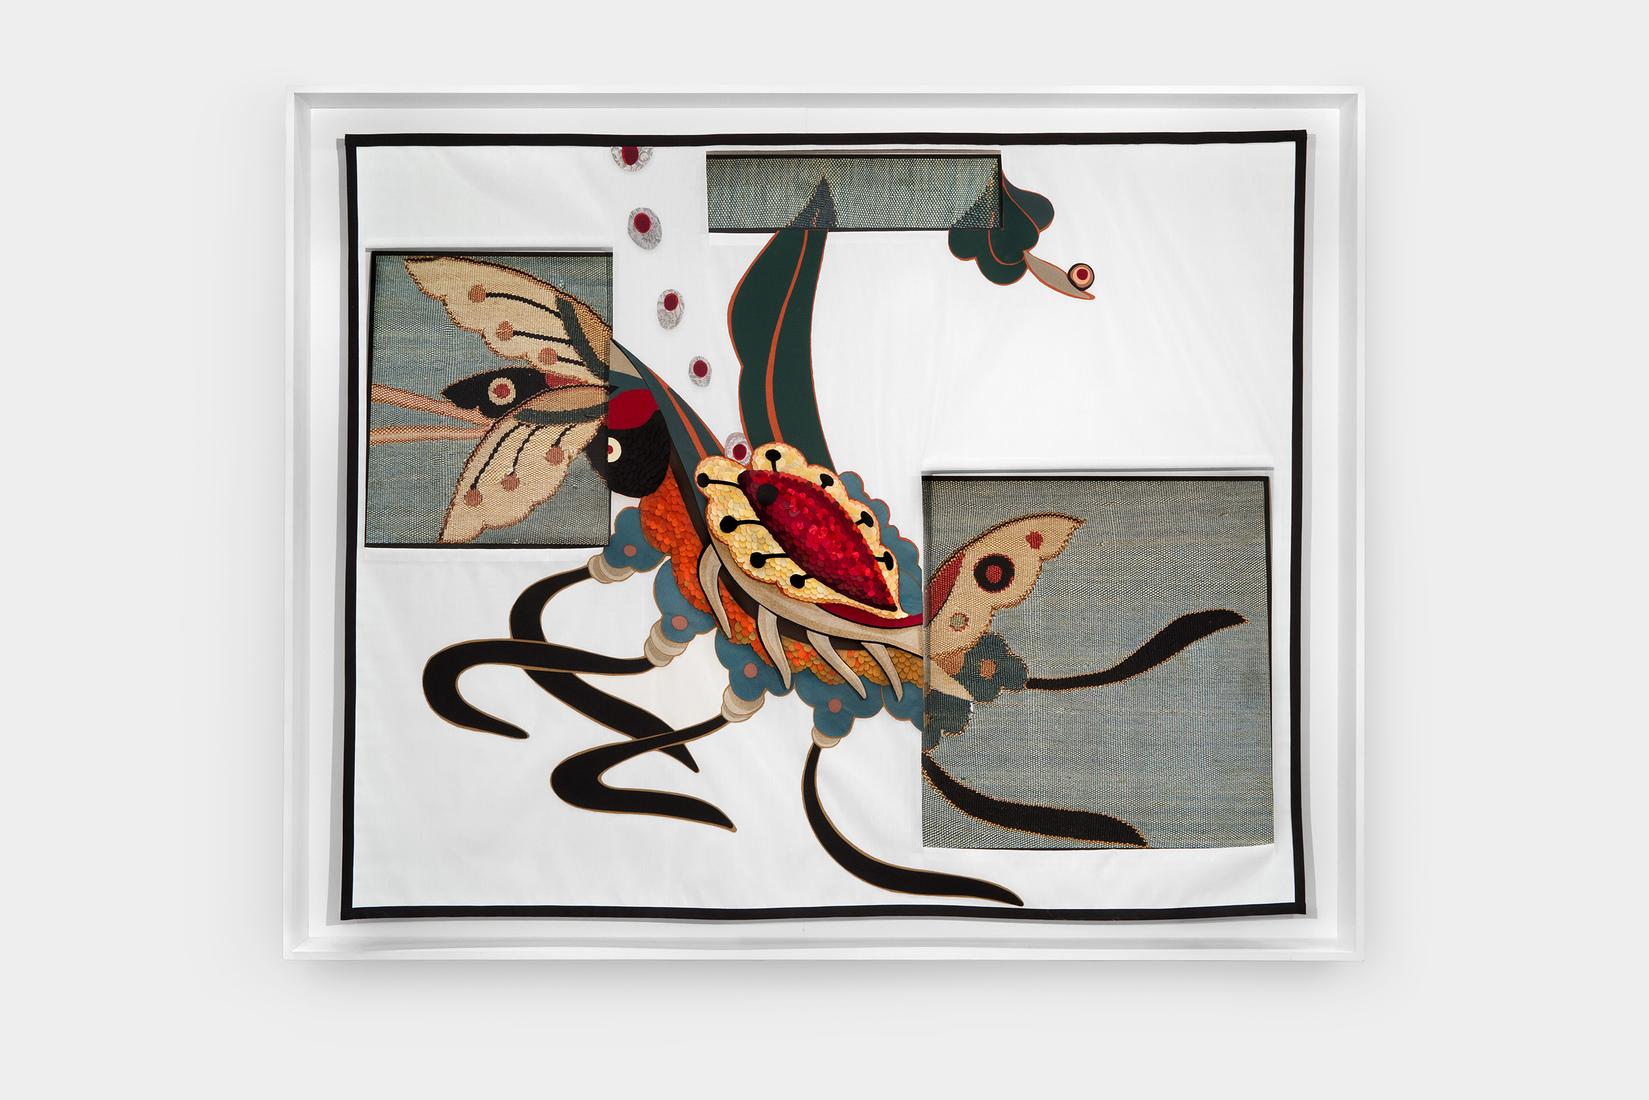 GERHARDT KNODEL Minglings: A Journey Across Time: 2015-2017 Genomia, Marvolia, Propogacia, 2015-2017, 74 x 92 x 6 in.